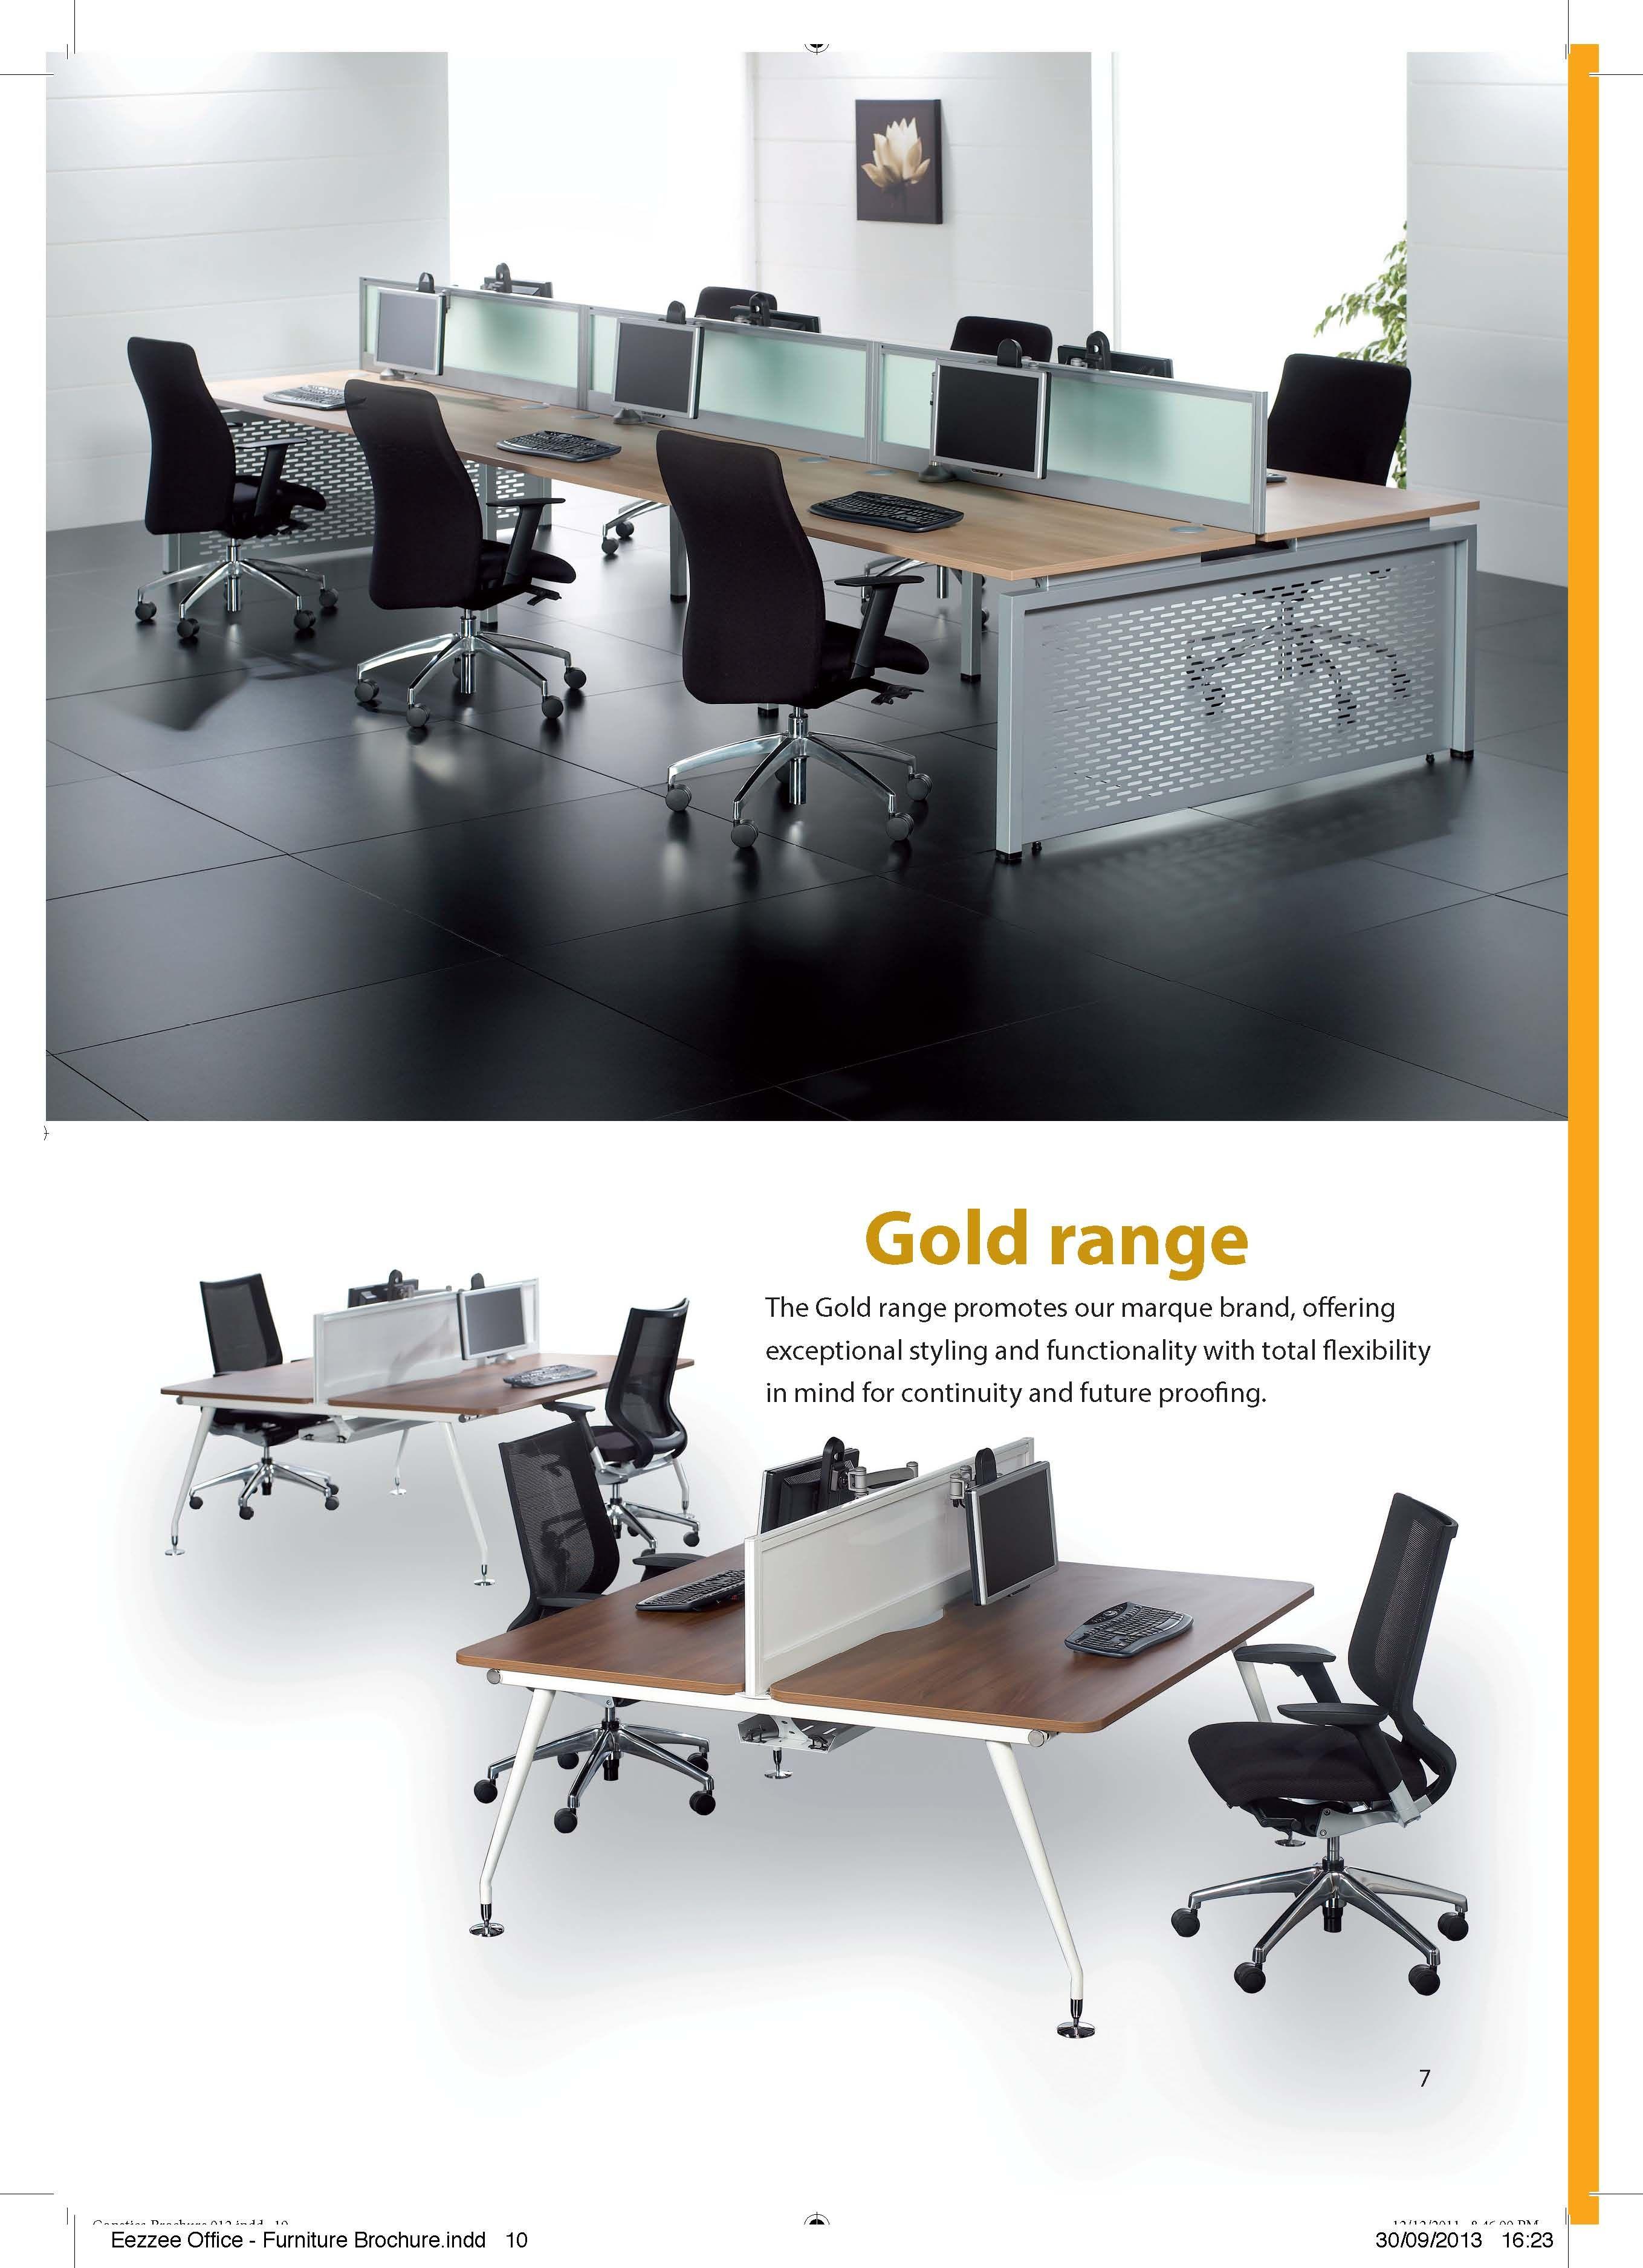 Büro Möbel Büro Möbel Prospekt | BüroMöbel | Pinterest | Büro ...